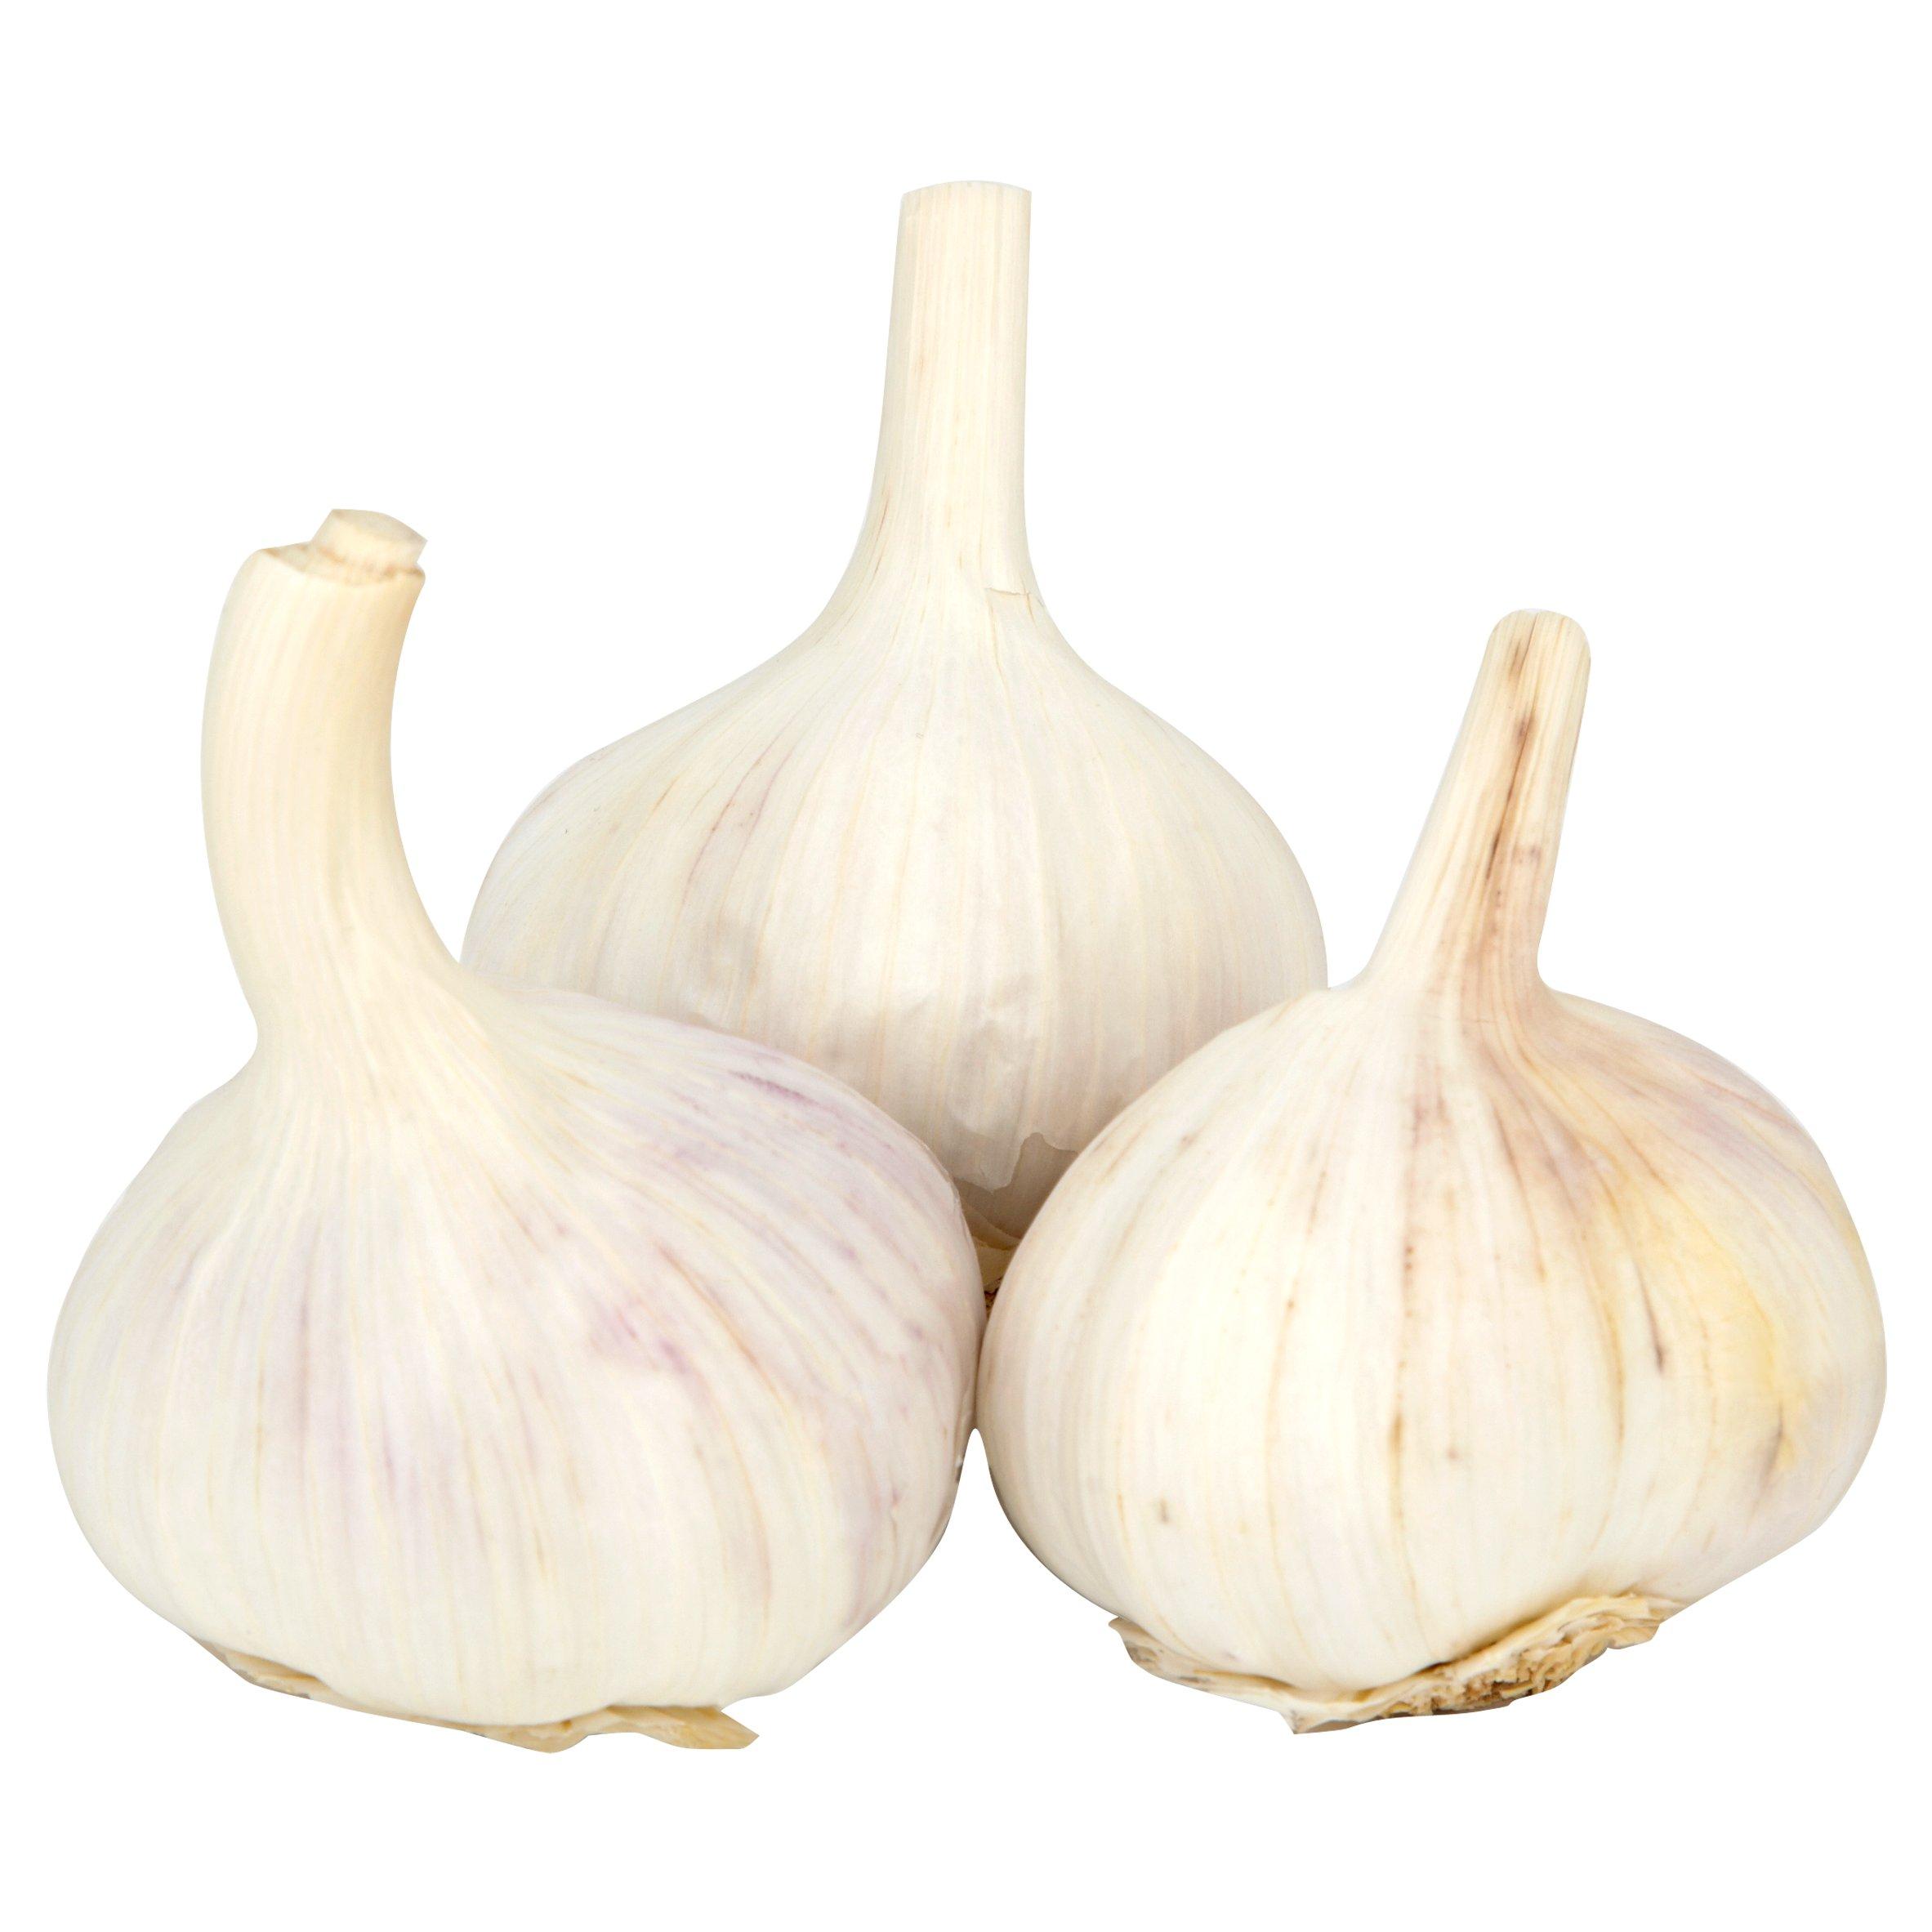 TESCO > Fresh Food > Tesco Garlic Each